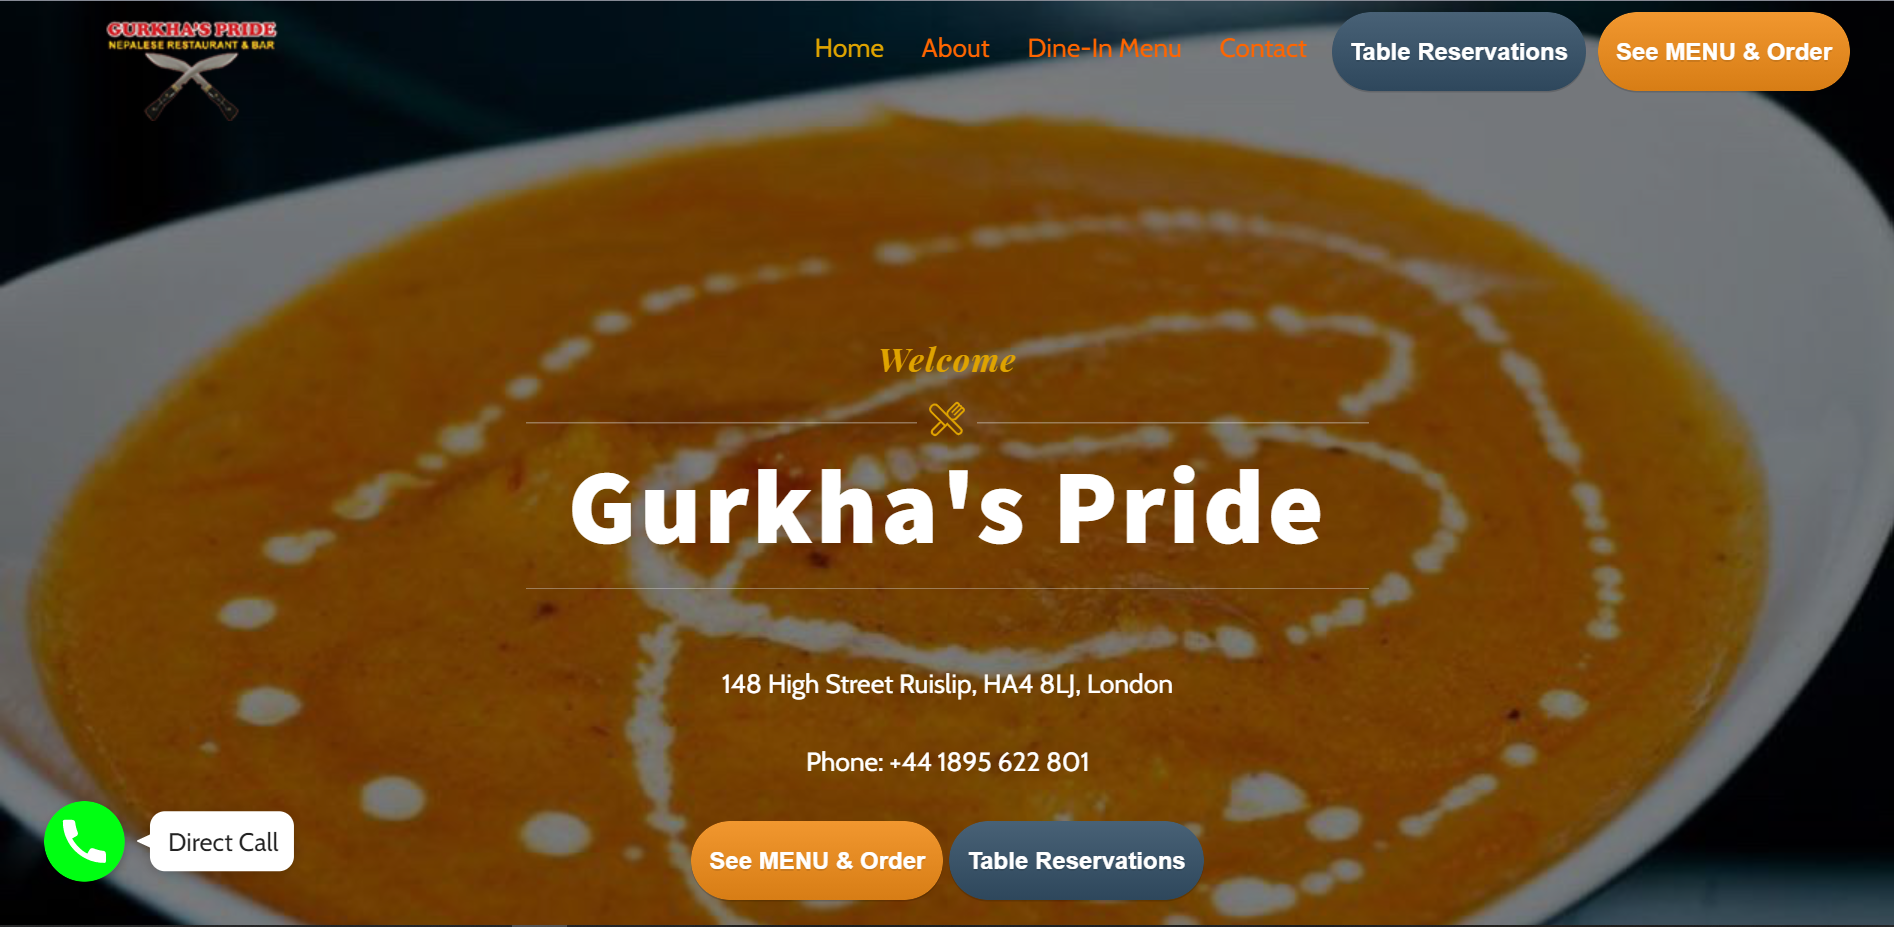 Technical Solutions for Gurkha's Pride Restaurant